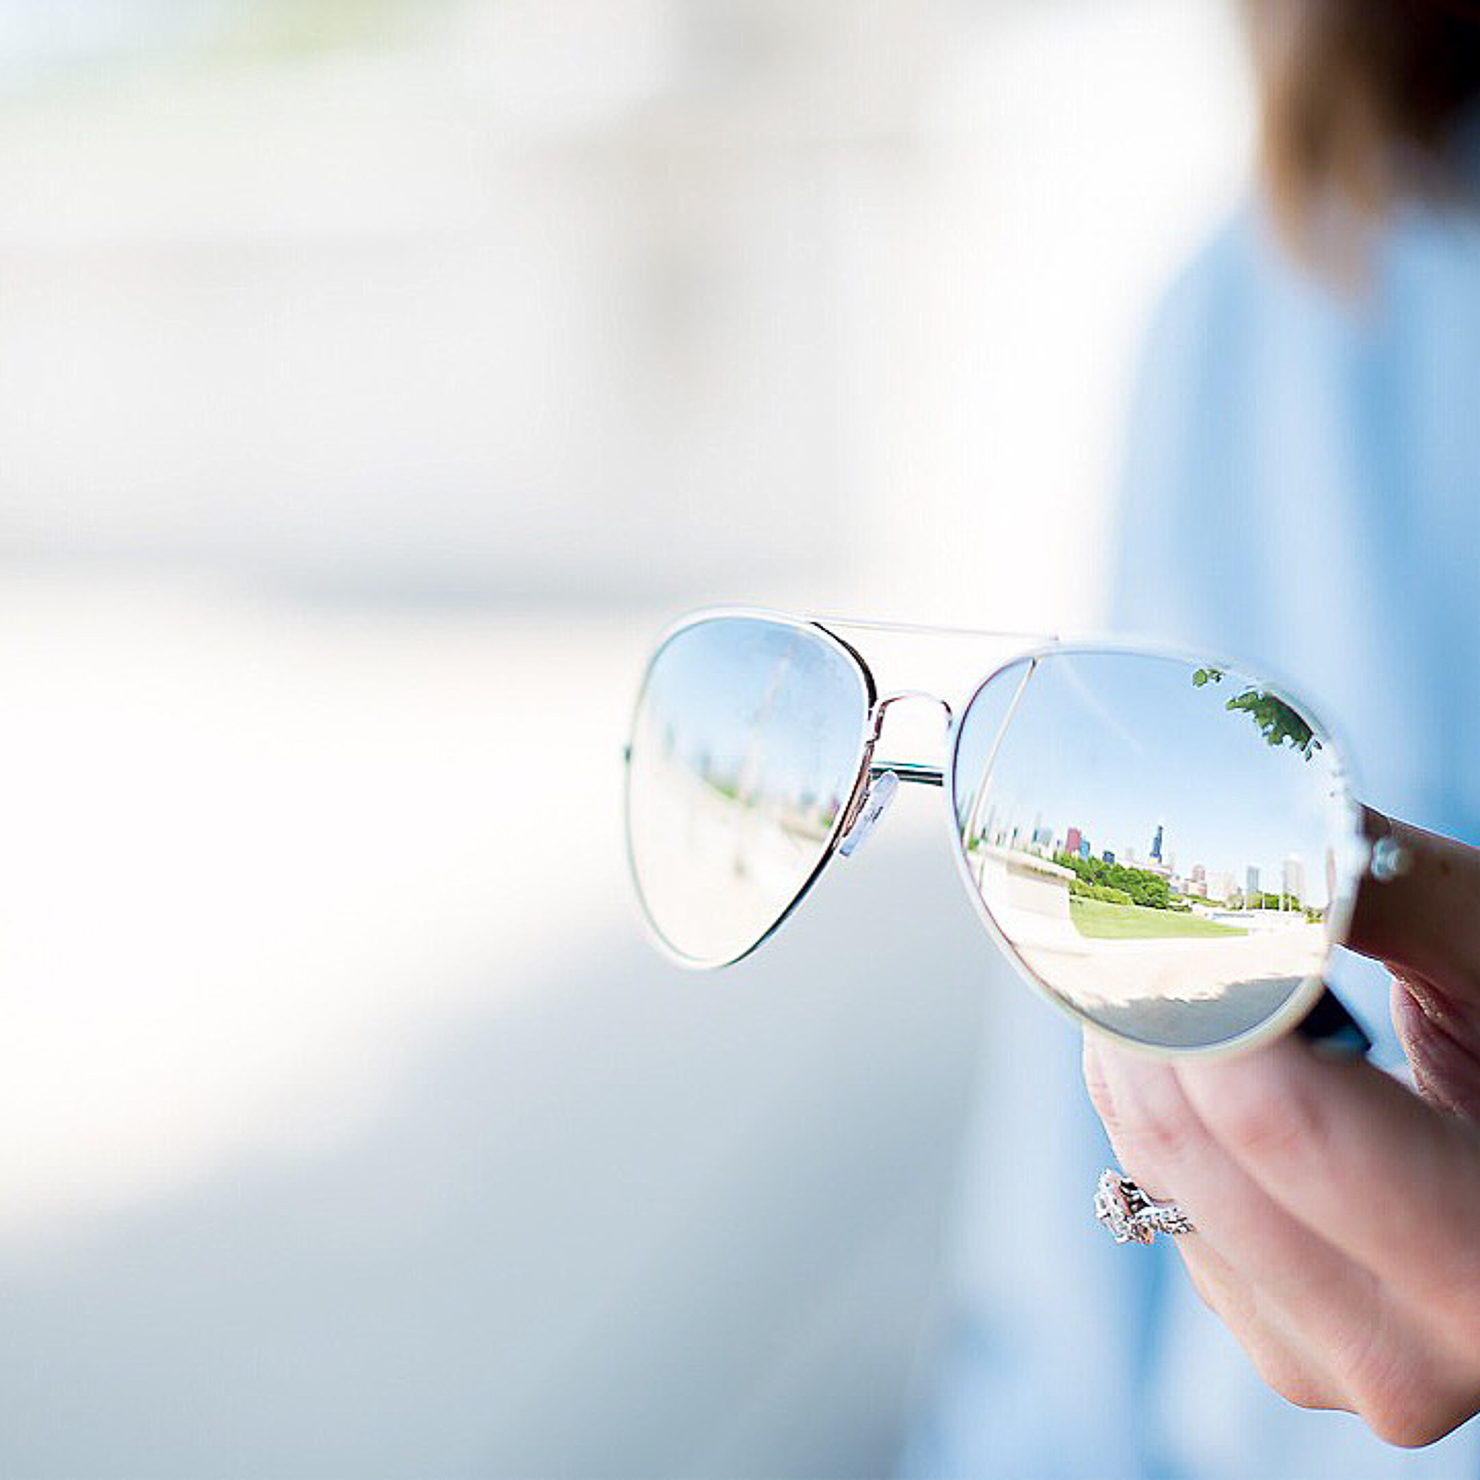 city-skyline-relected-in-sunglasses-chicago-skyline-mirrored-aviators